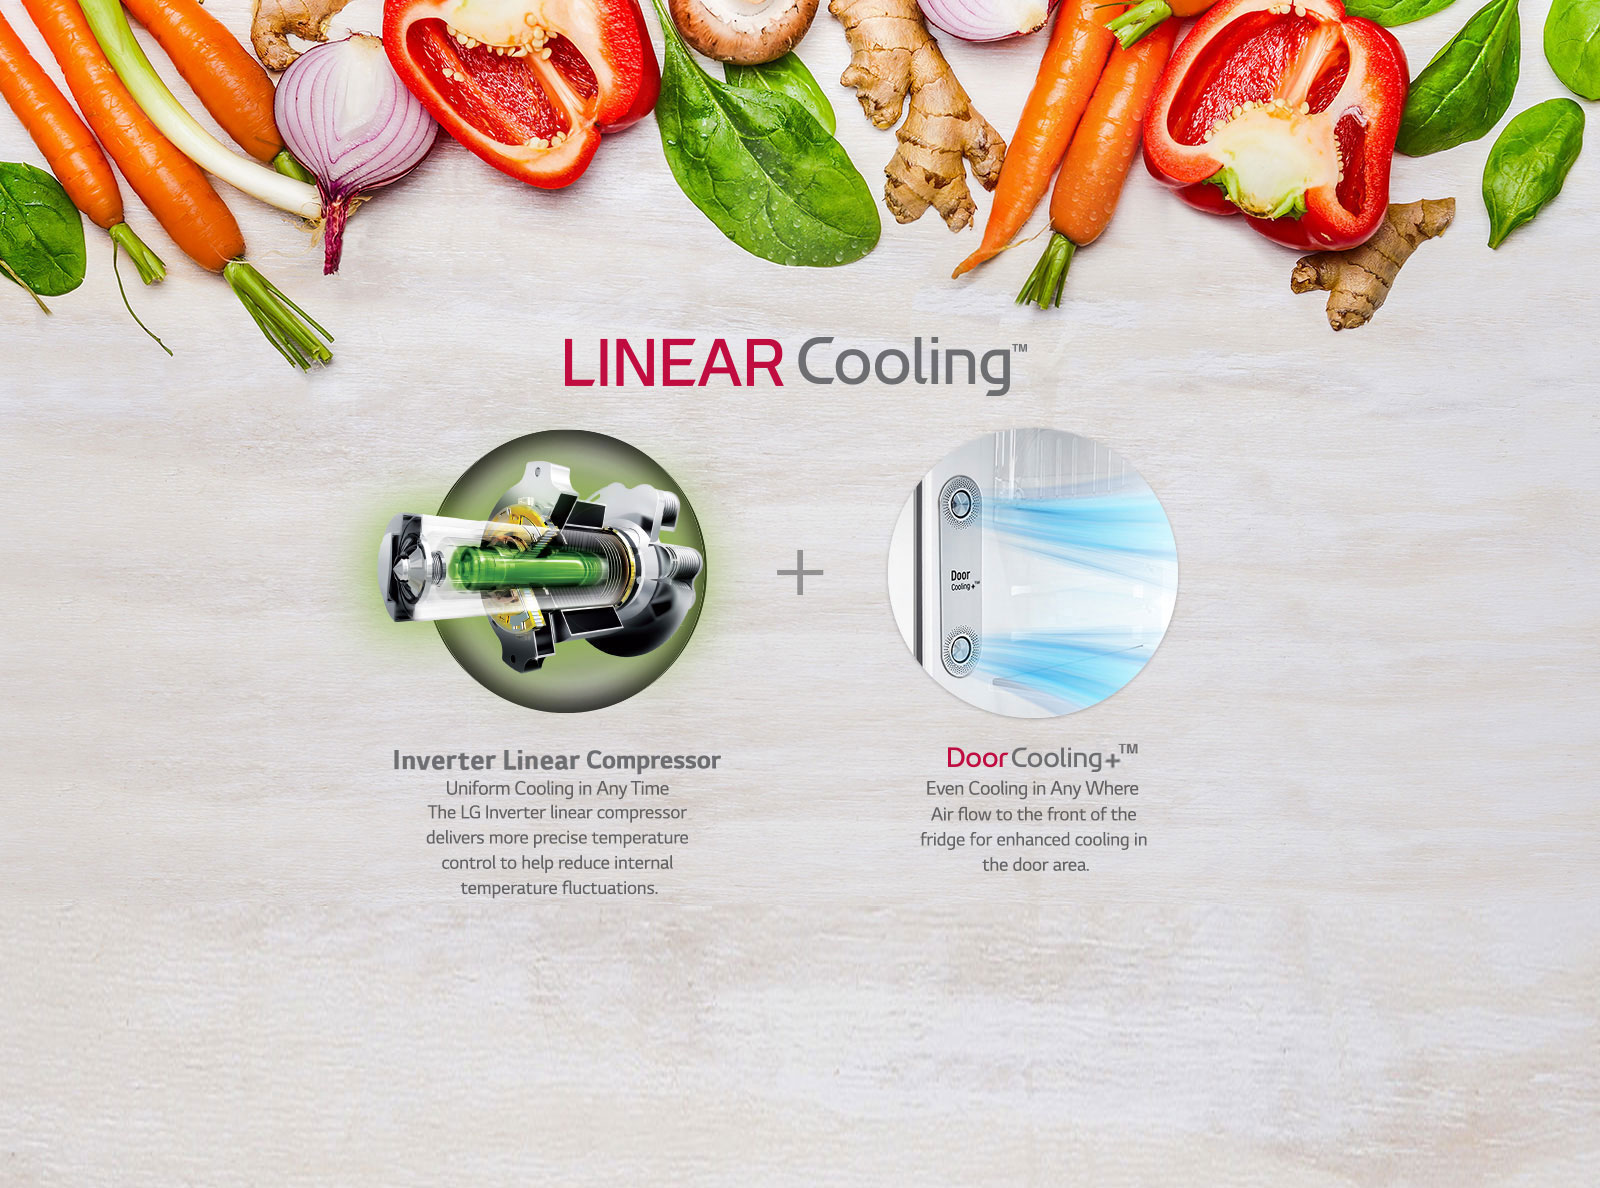 LG GL-T502FPZ3 471 Ltr Linear Cooling